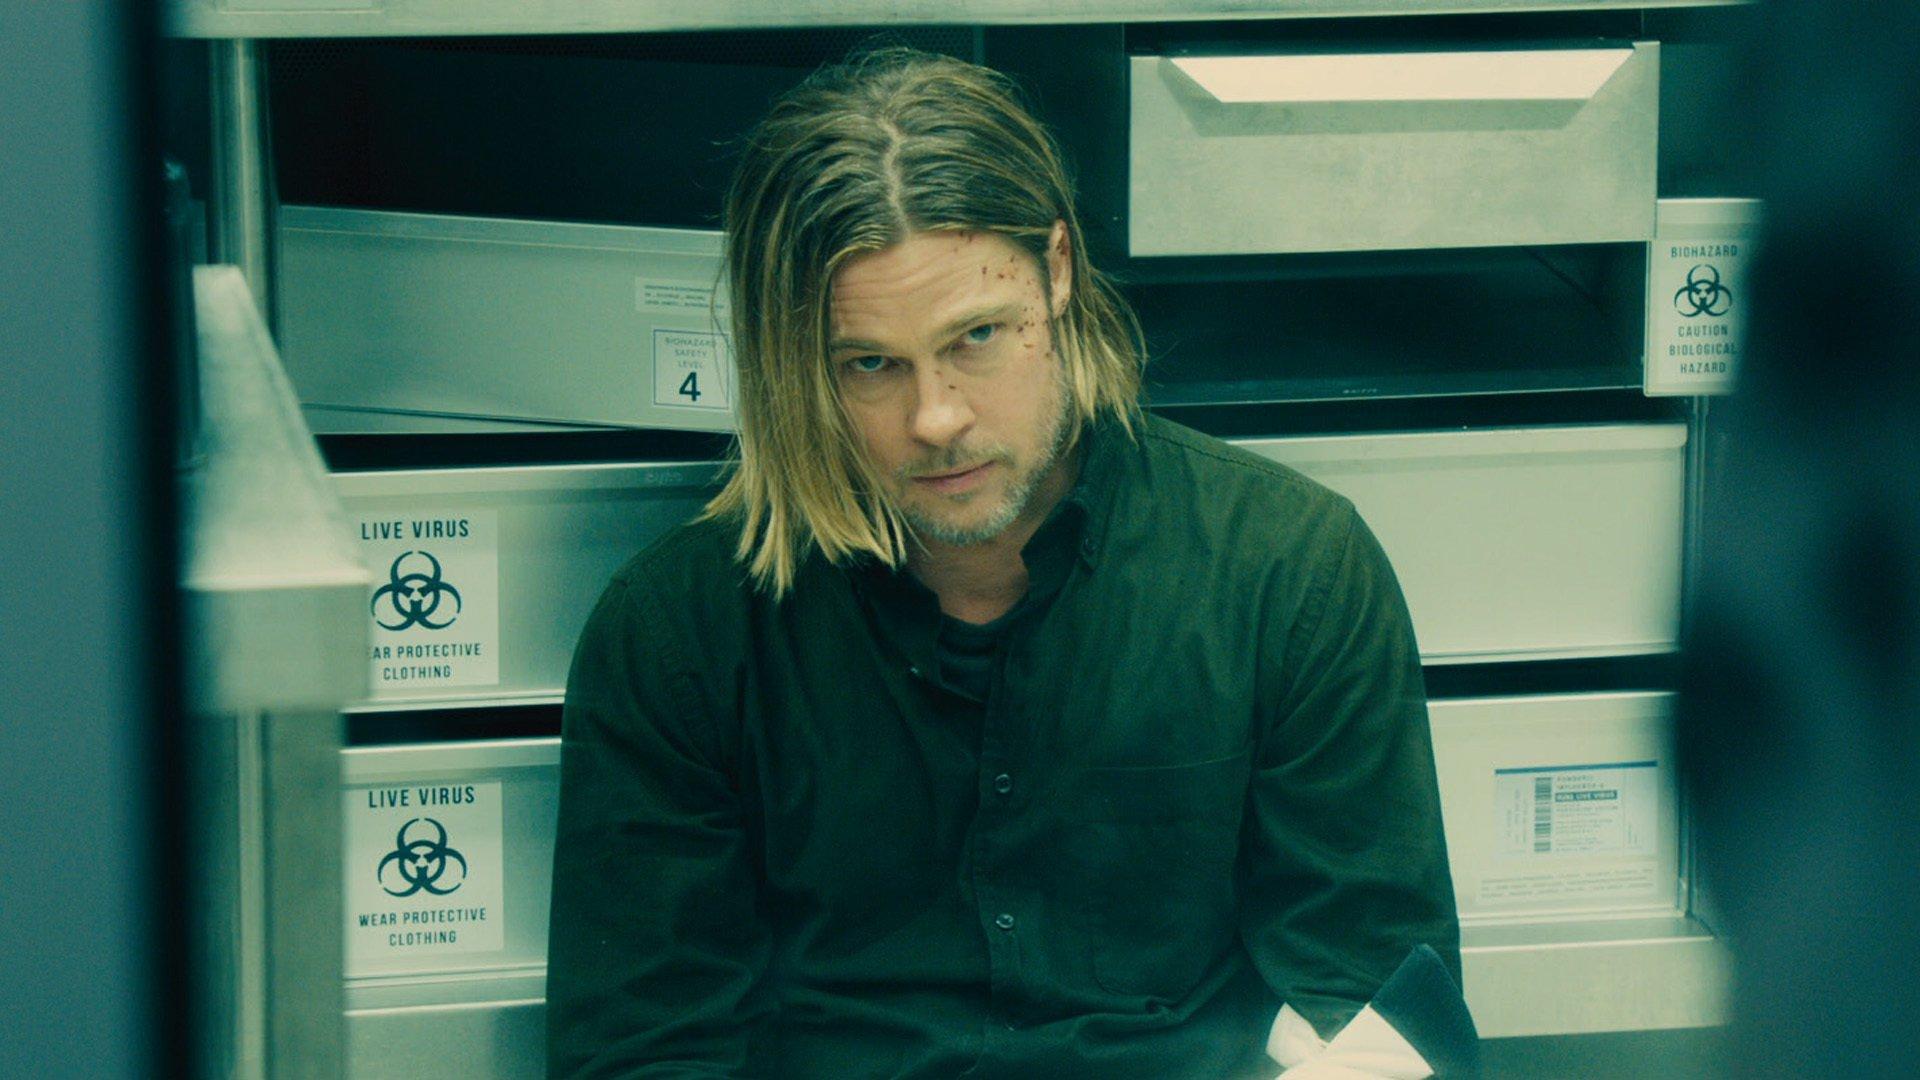 Brad Pitt Movies World War Z Full Movie Winx Club Season 6 Episode